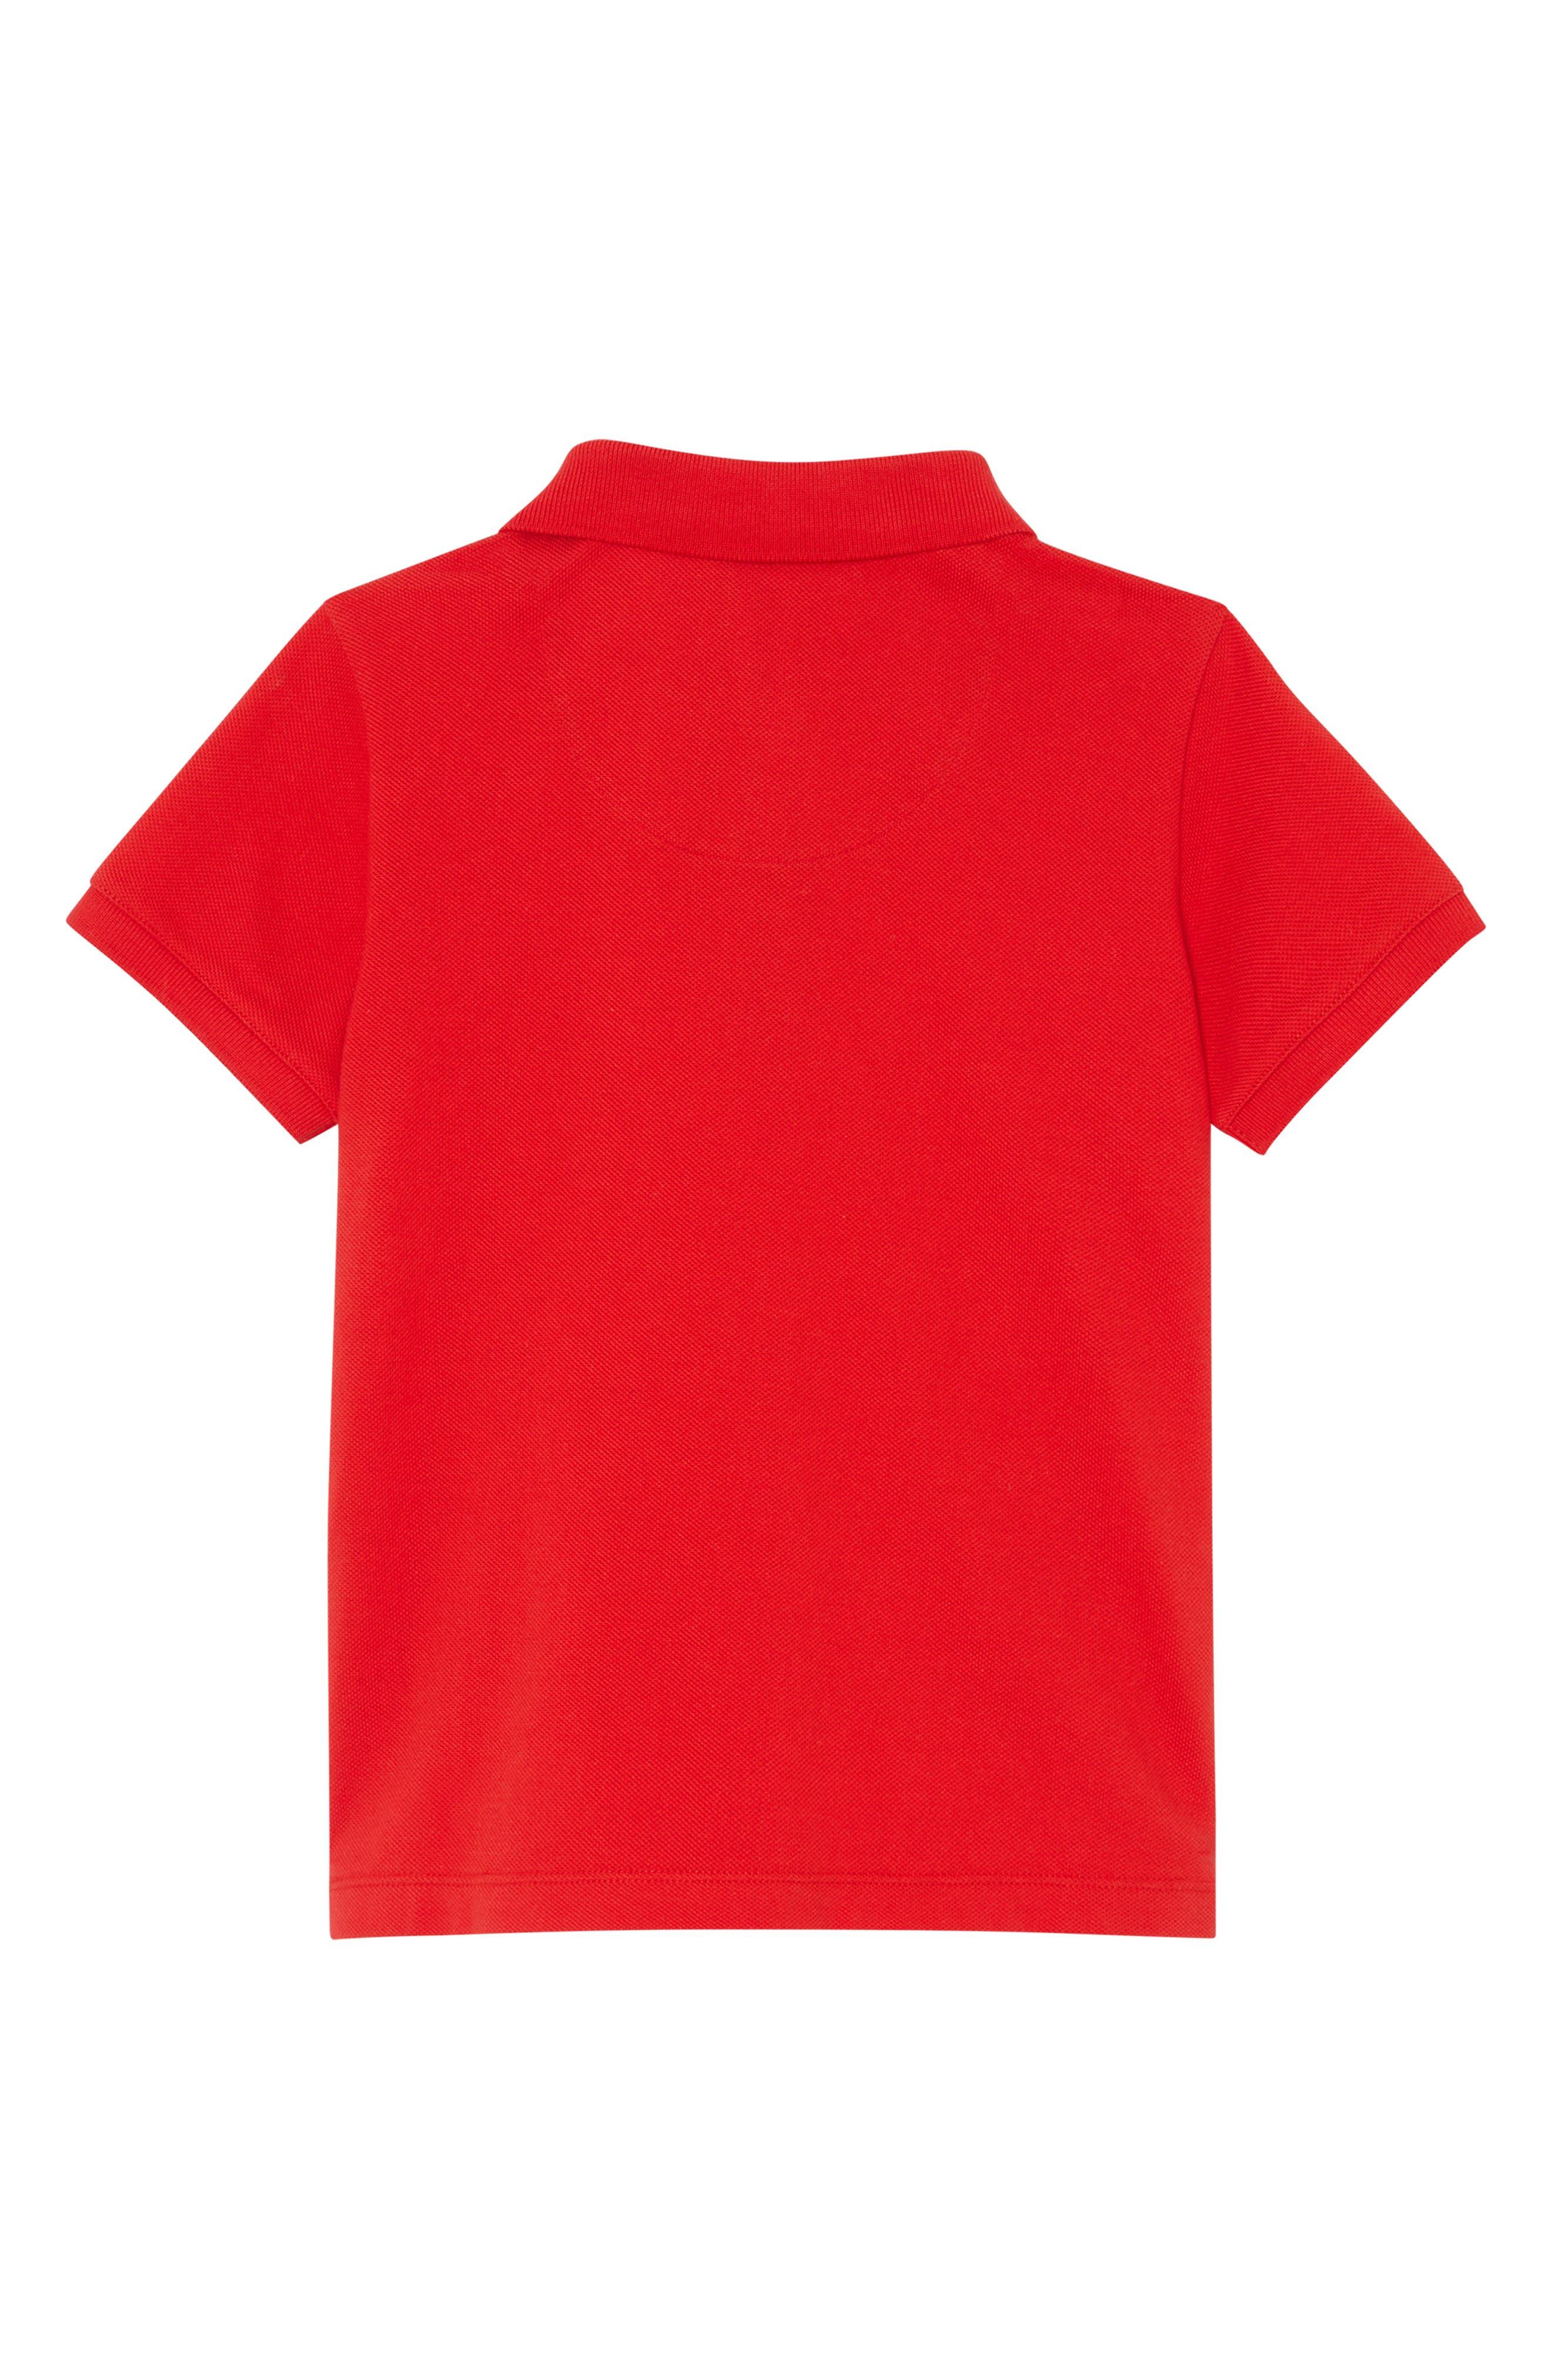 BURBERRY, Logo Cotton Piqué Polo, Alternate thumbnail 2, color, BRIGHT RED